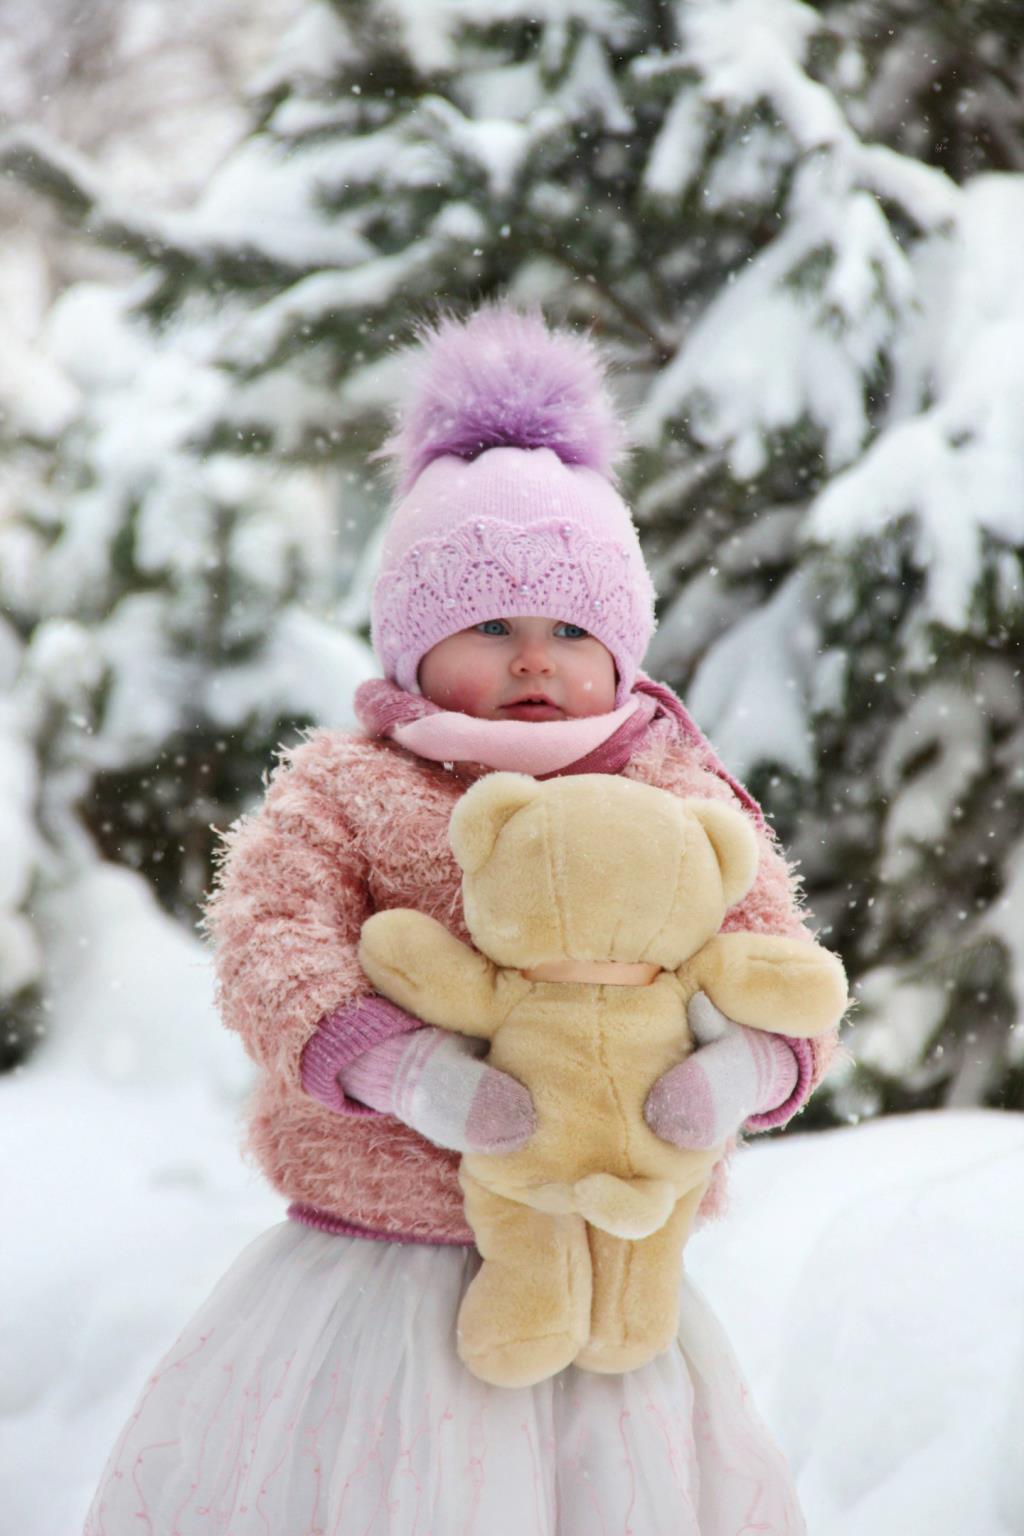 Снежная принцесса. Веселая зима